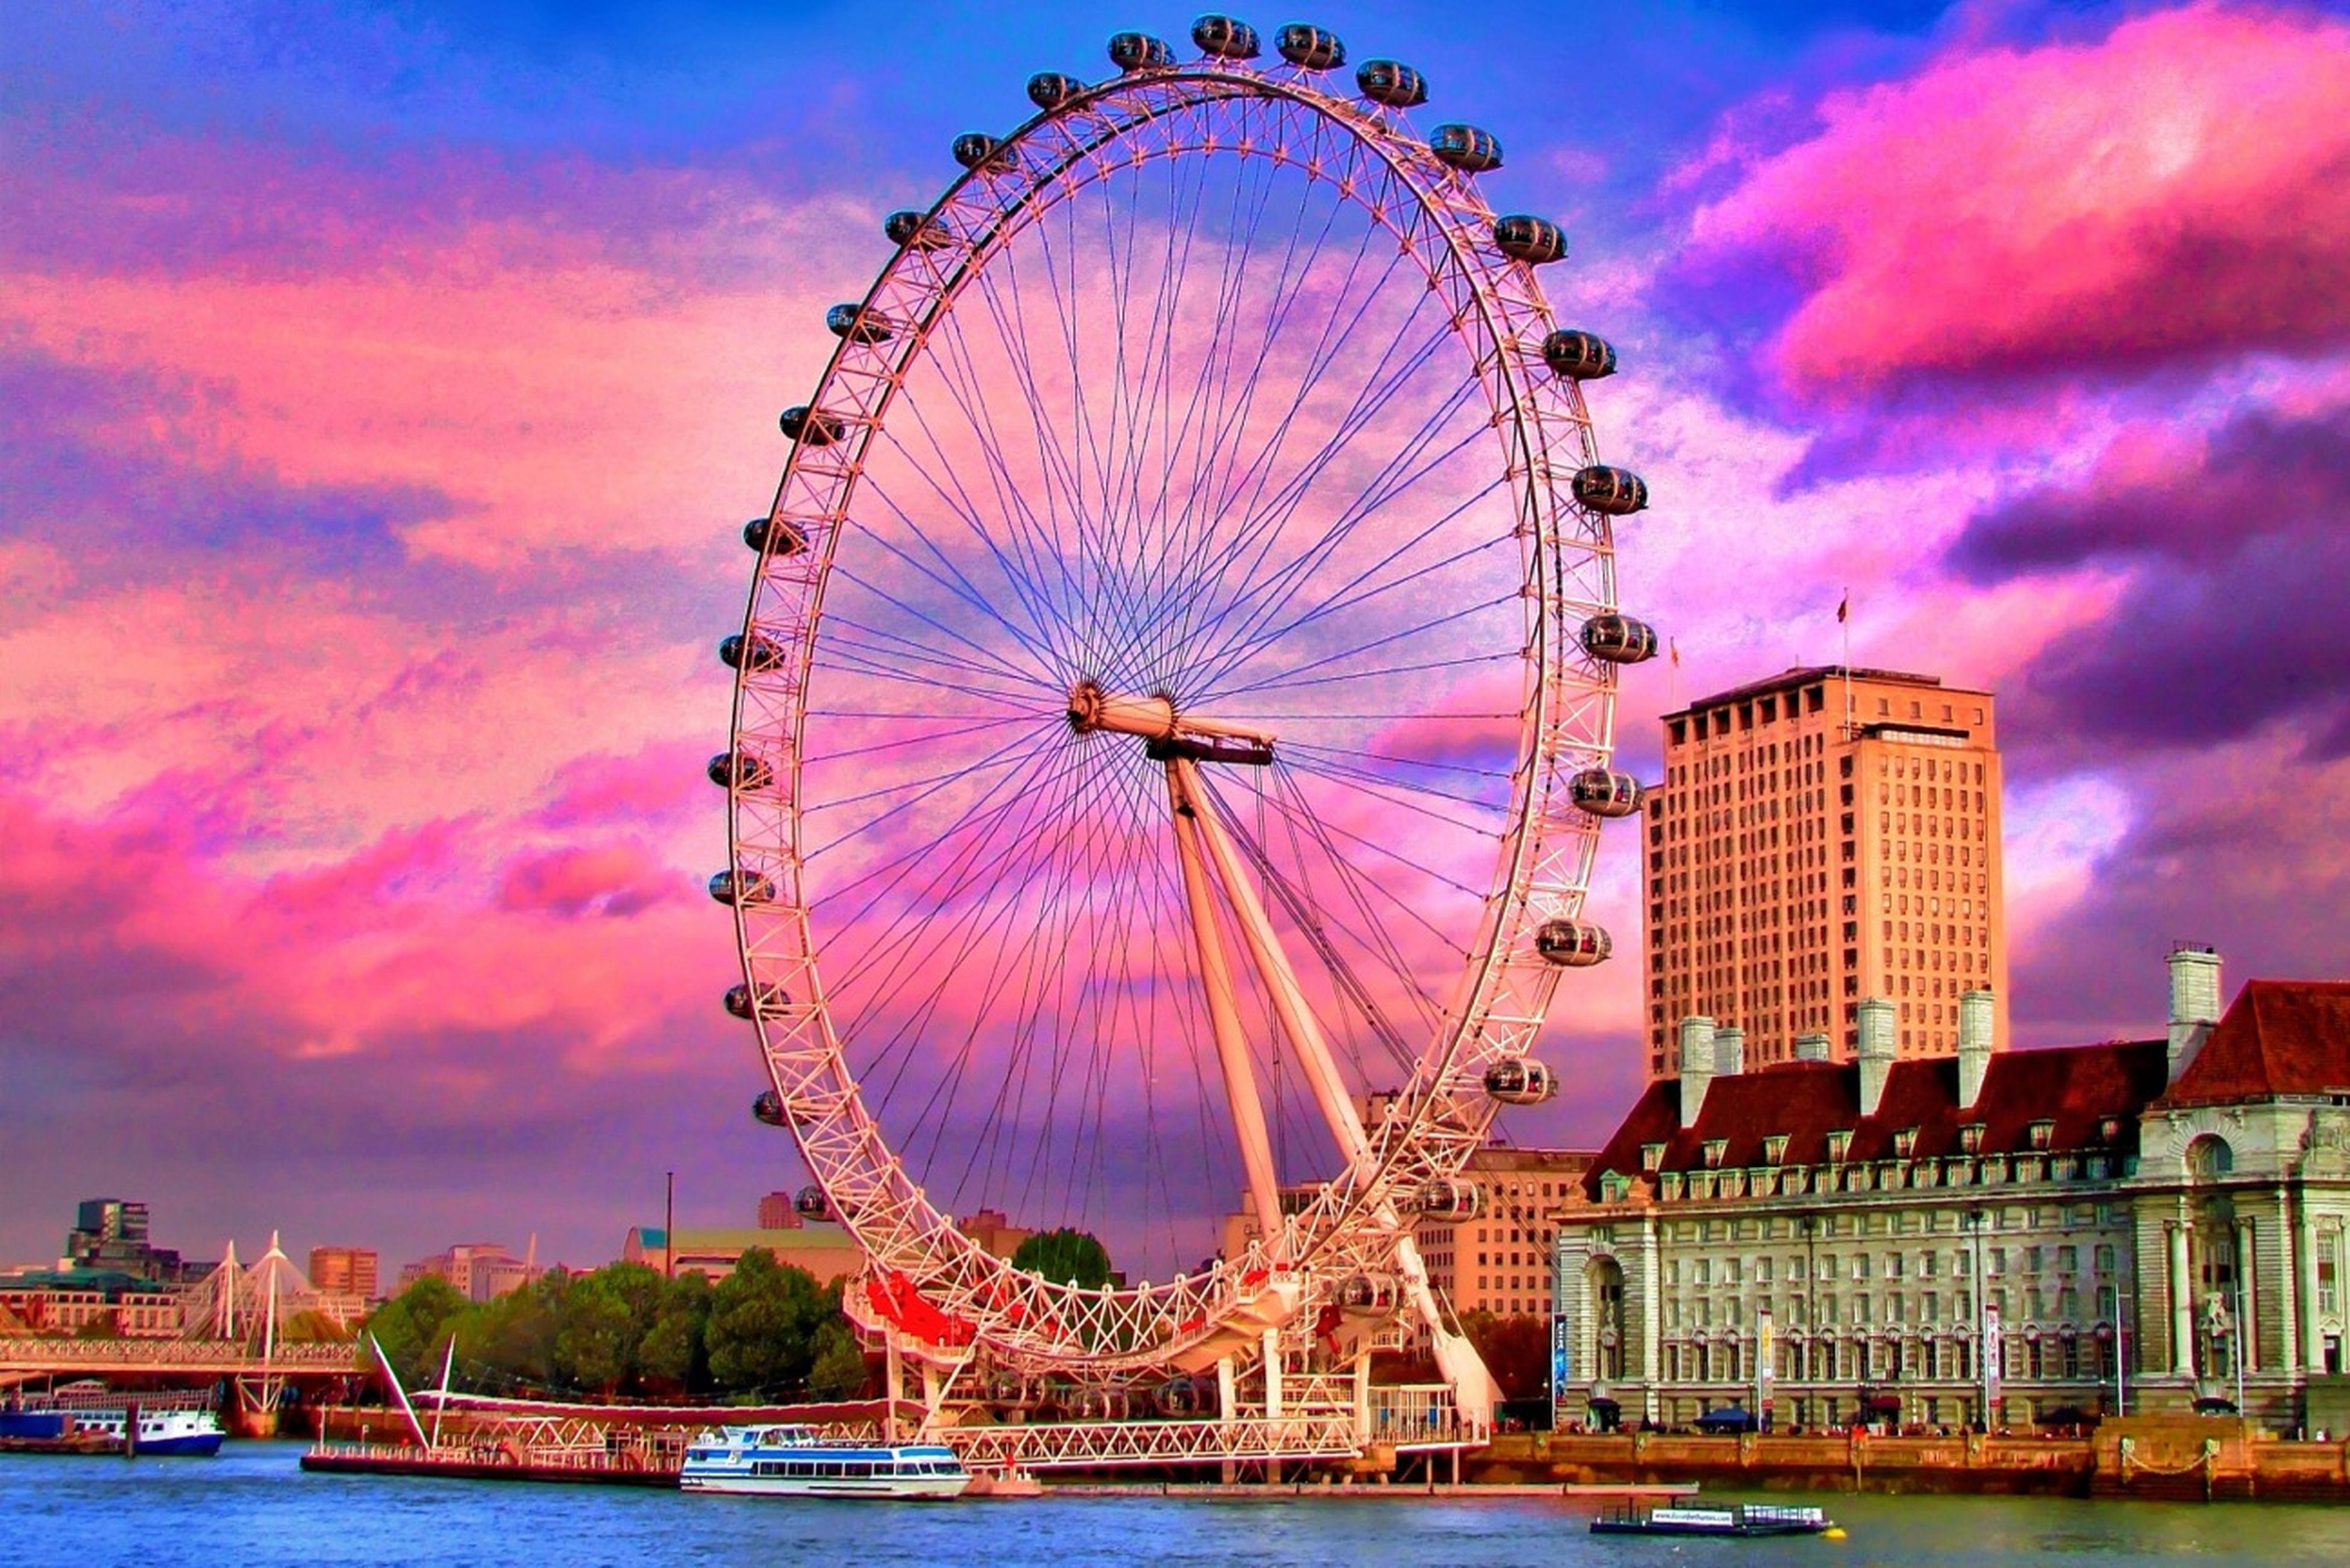 London (Photo by me edited by my dear friend @nala_rinaldo) Happy Weekend !!!!!